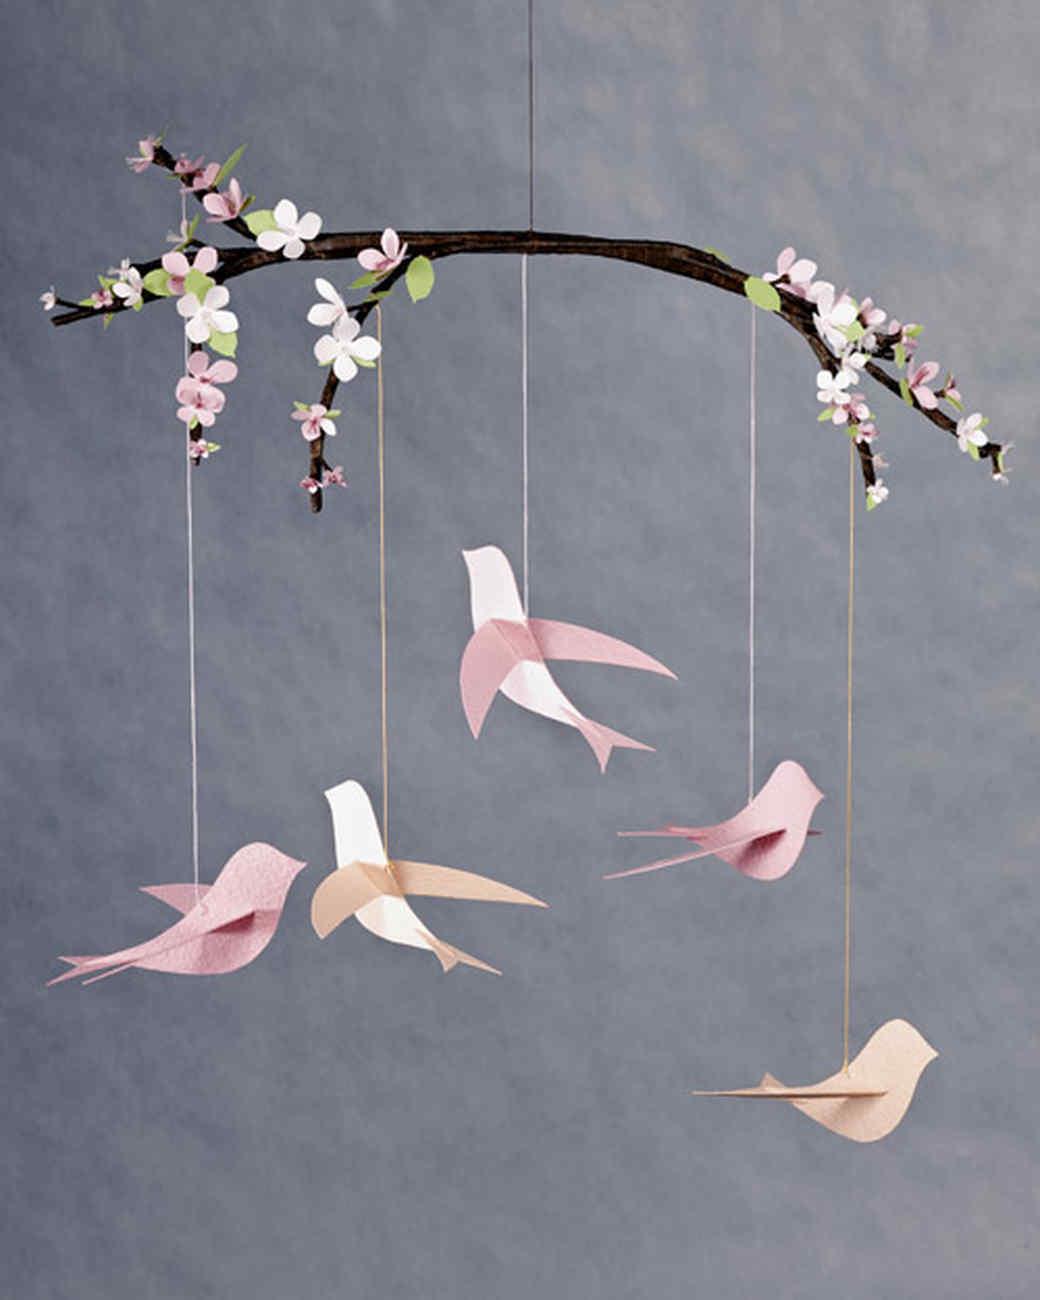 Bird Template Printable Martha Stewart - Worksheet & Coloring Pages